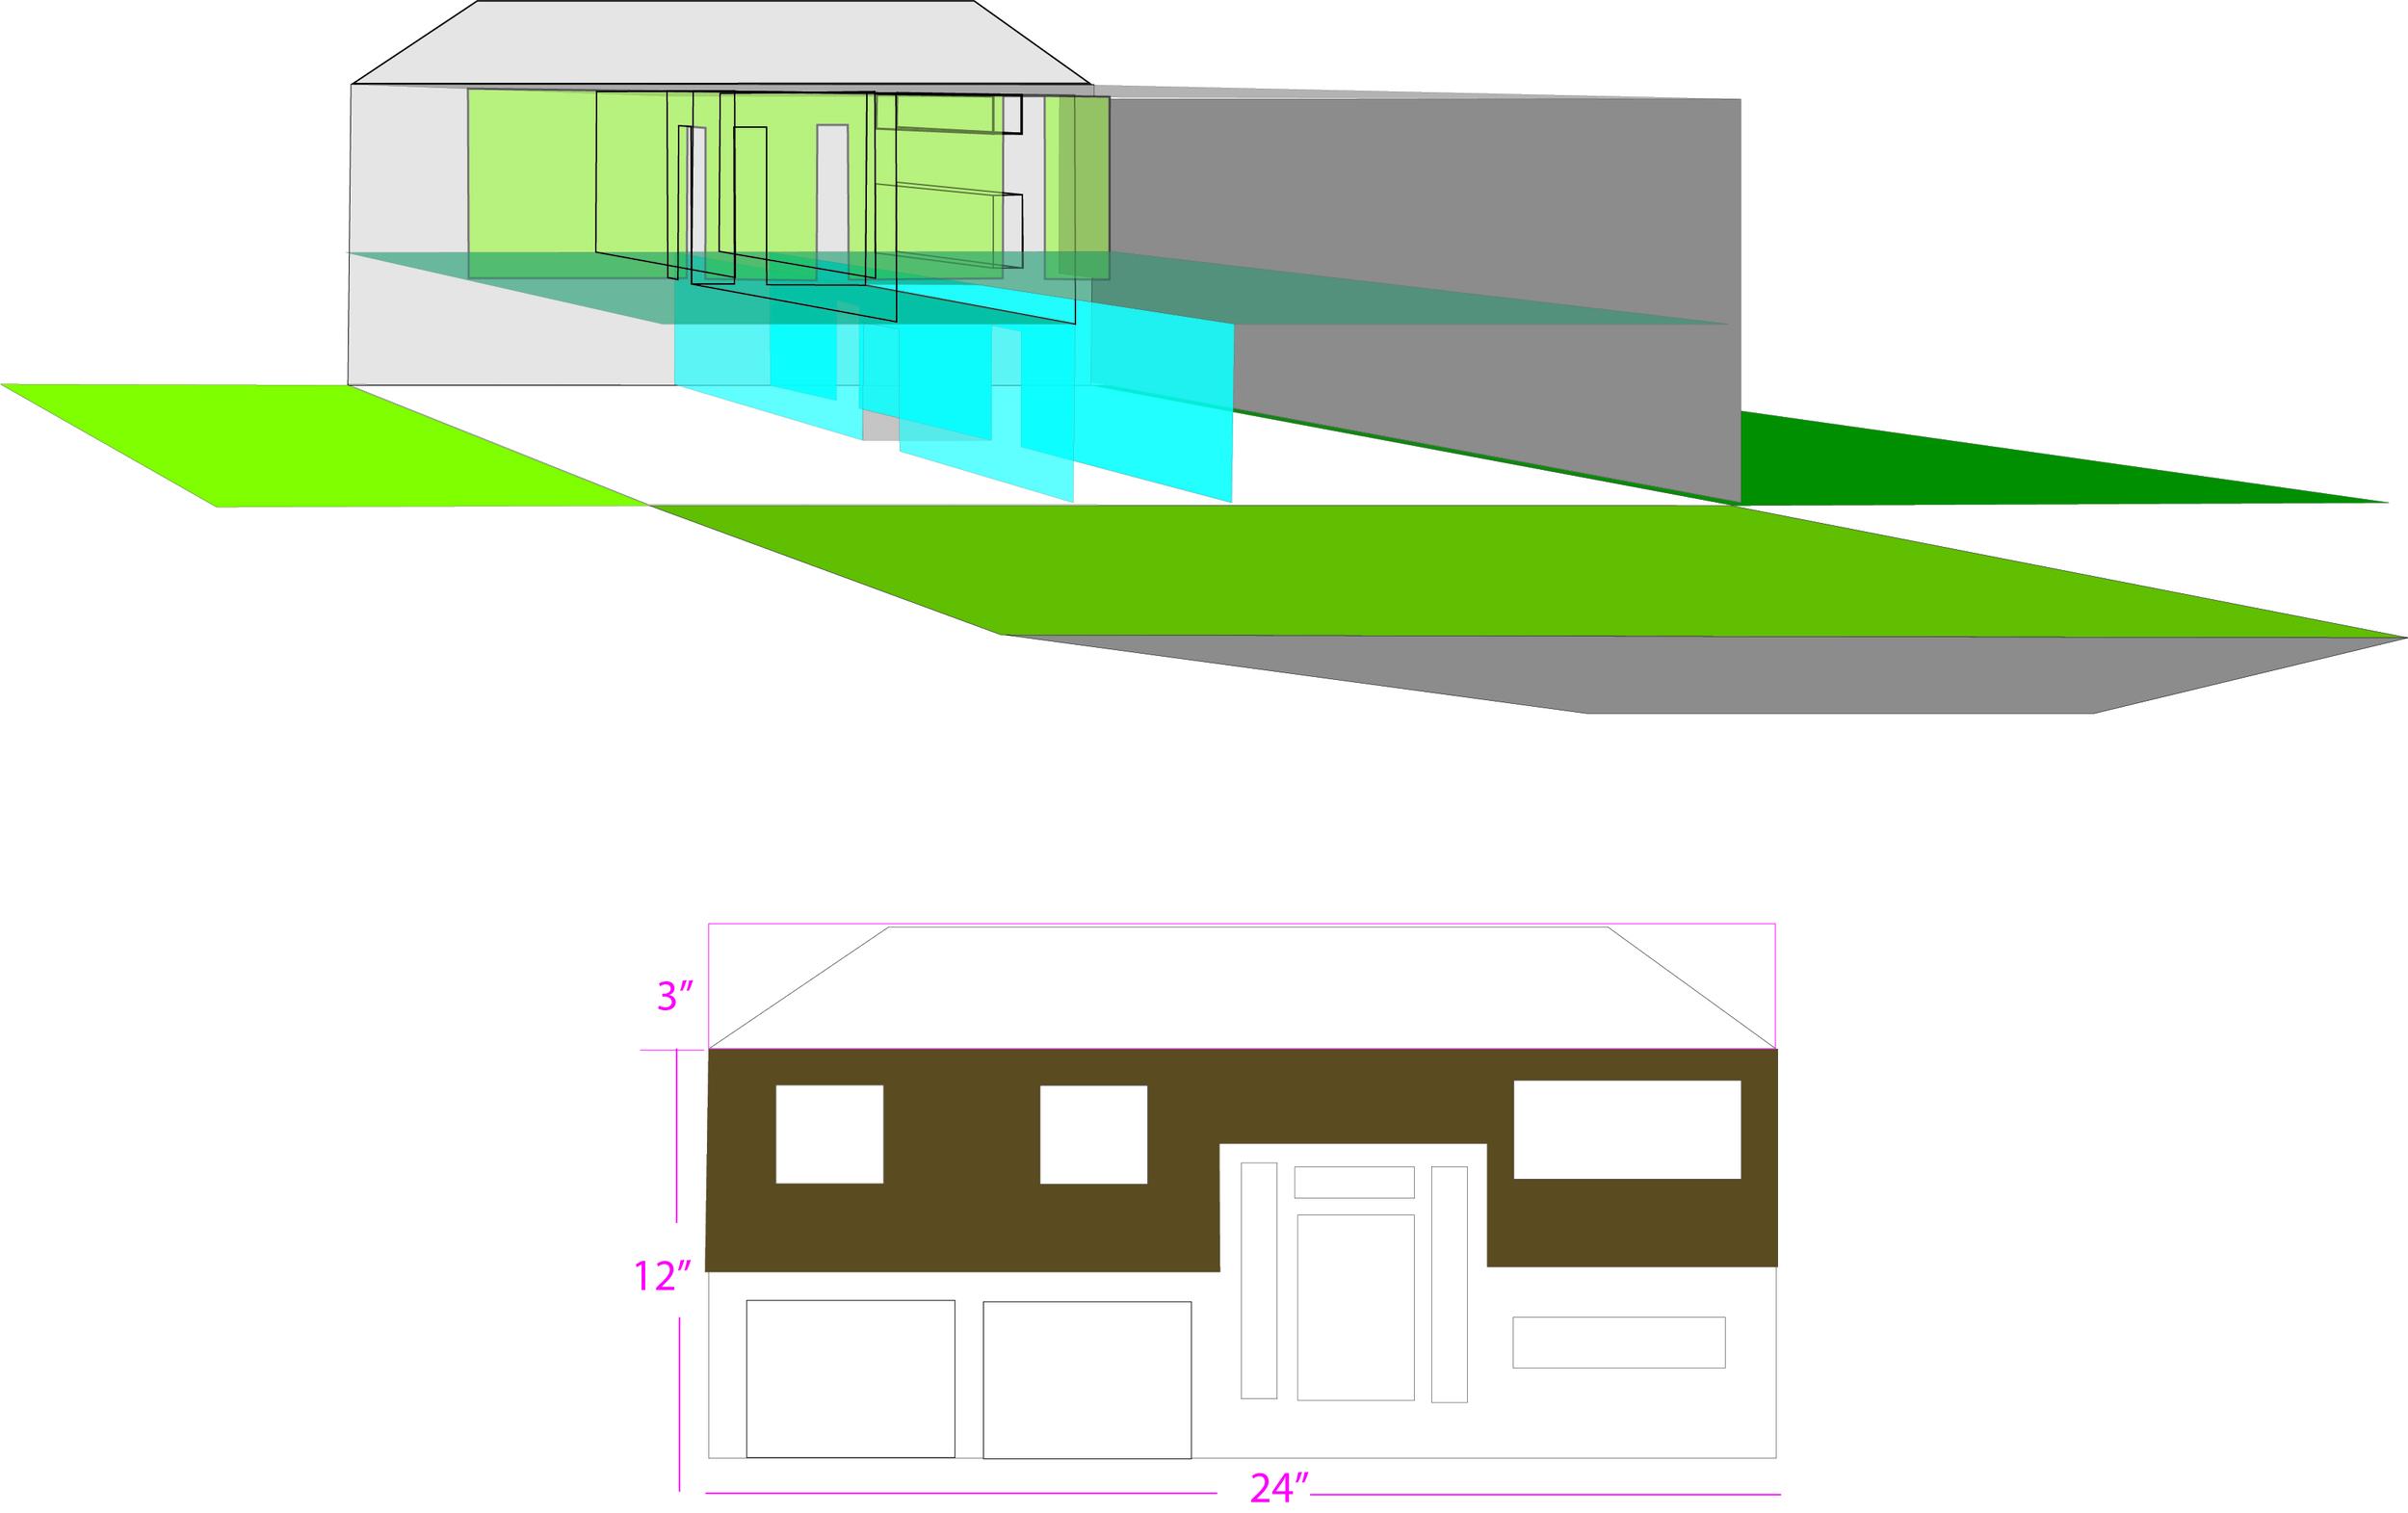 plan_overview.jpg